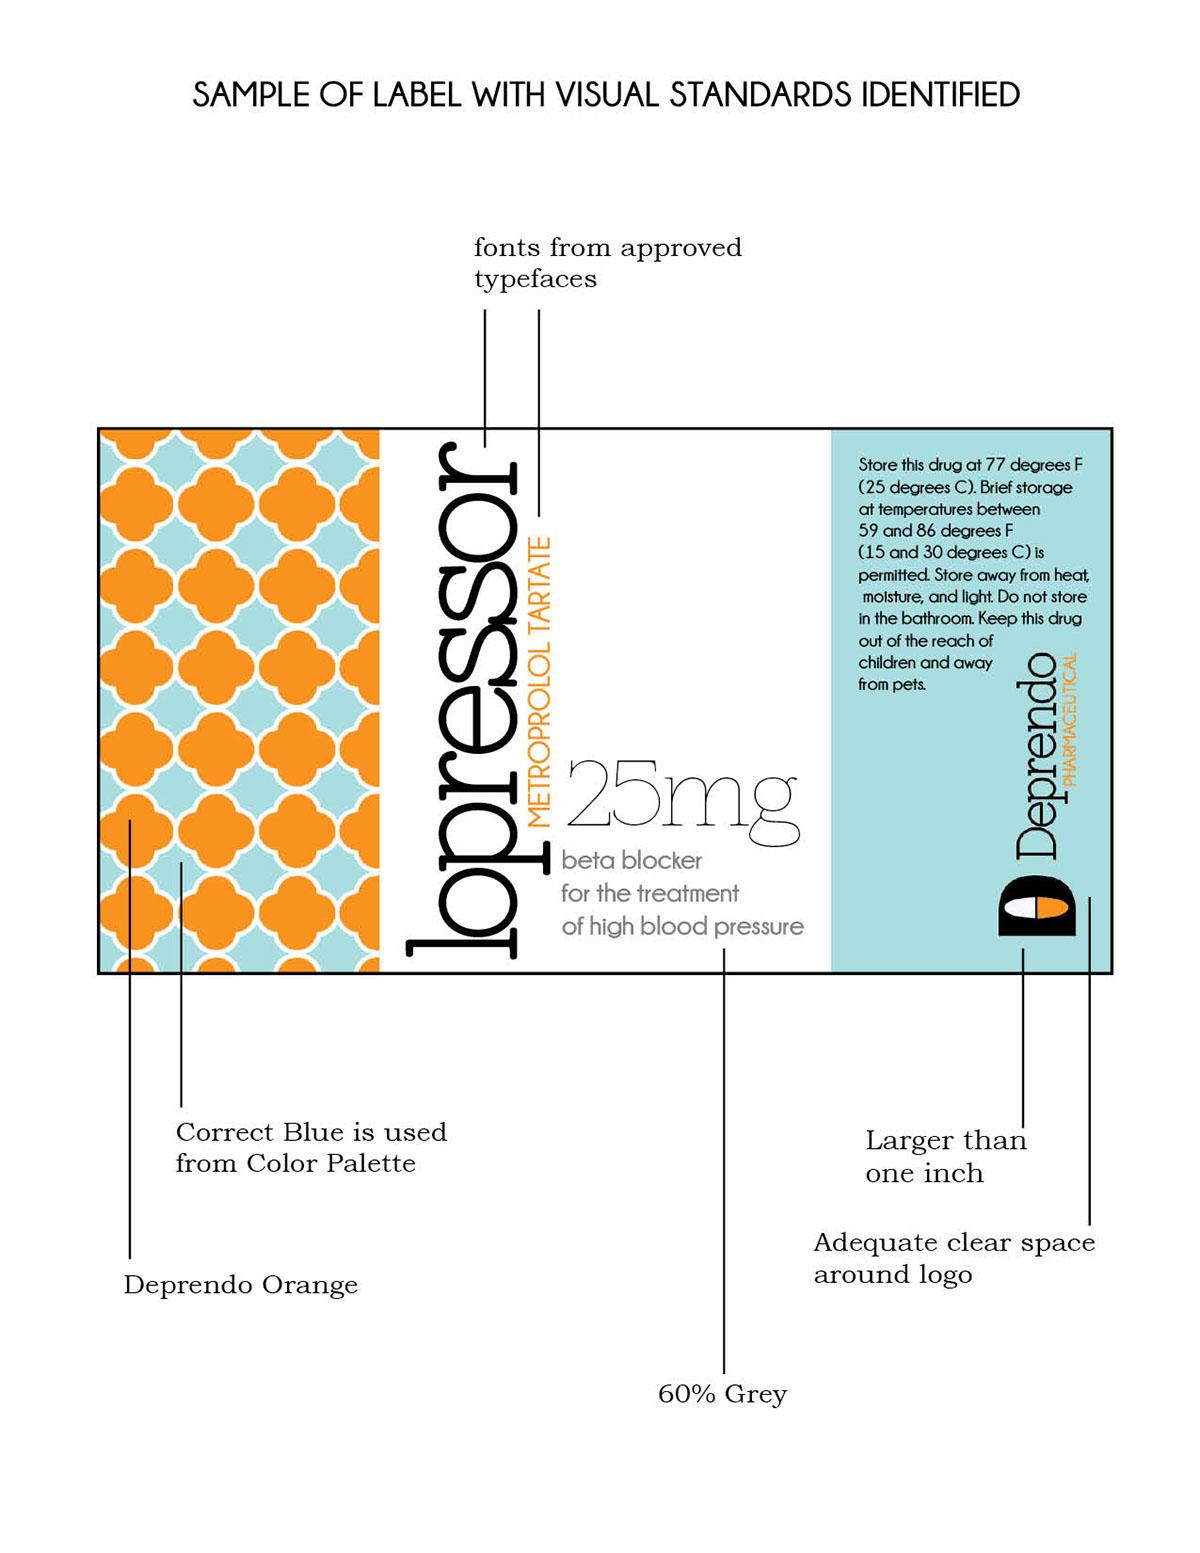 Deprendo Visual Standards Manual On Behance